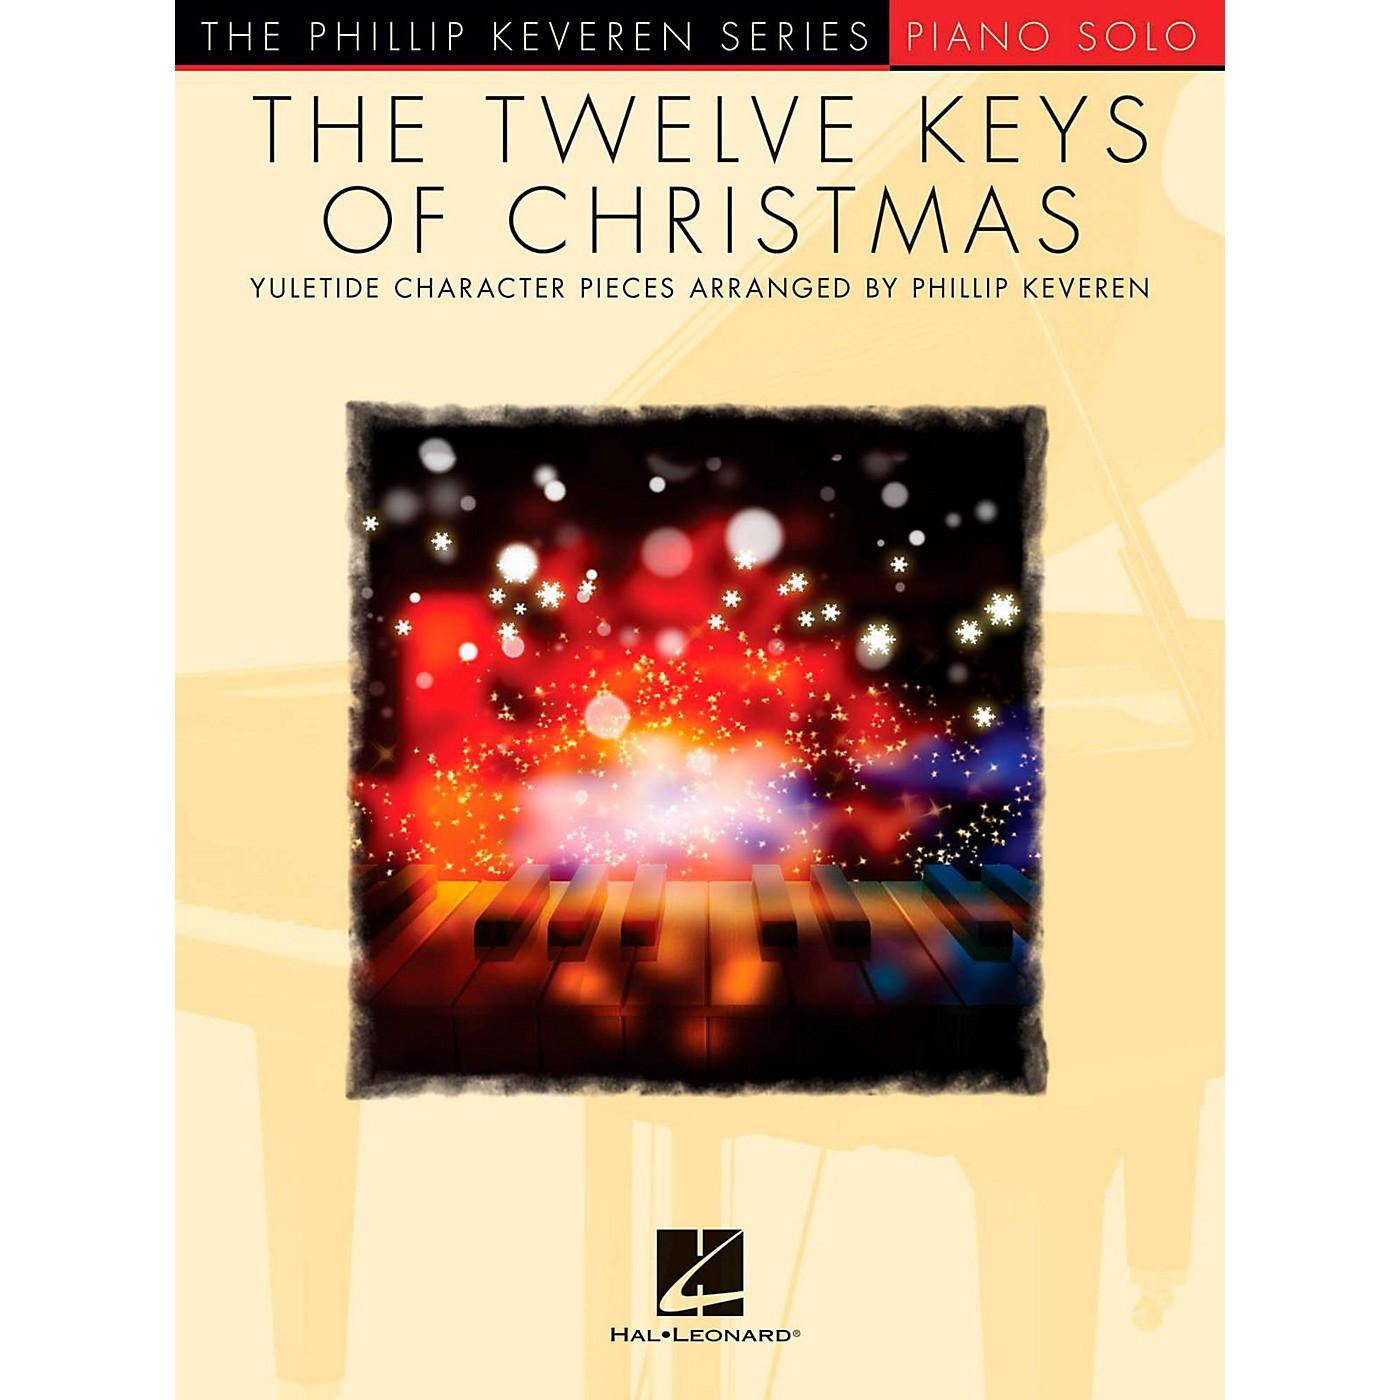 Hal Leonard The Twelve Keys Of Christmas - Phillip Keveren Series - Piano Solo thumbnail